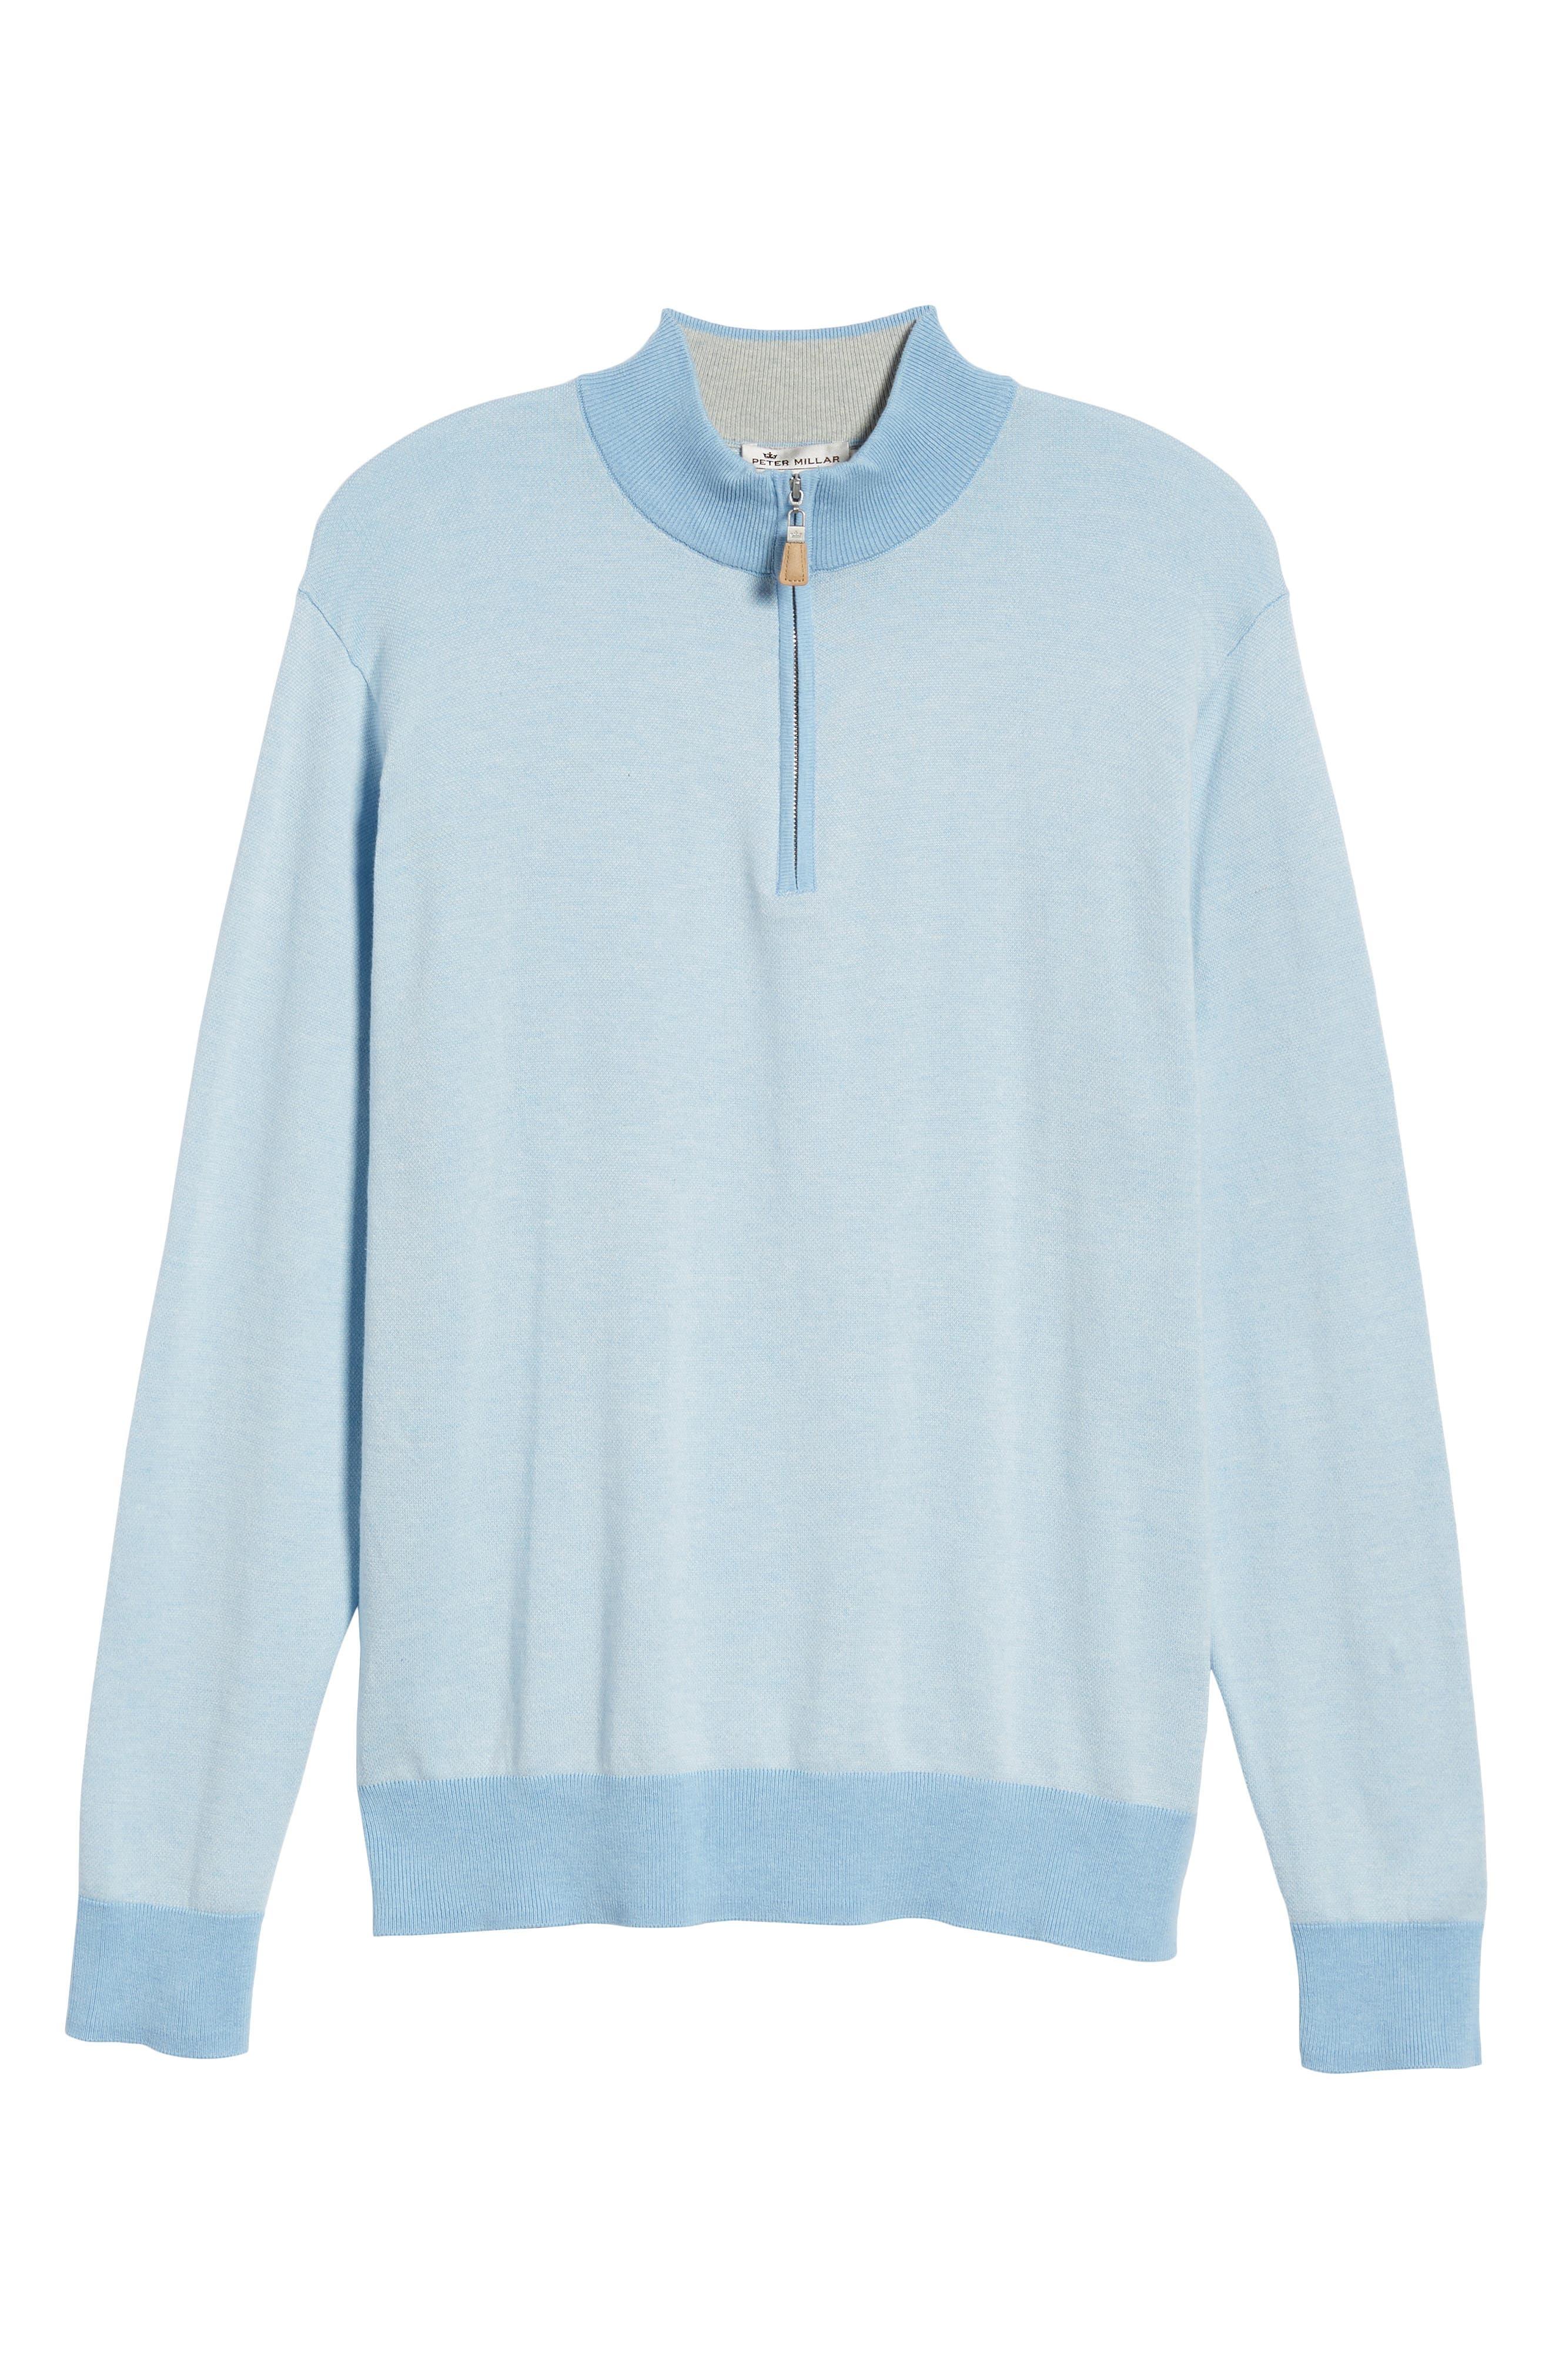 Crown Bird's Eye Cotton & Silk Quarter Zip Sweater,                             Alternate thumbnail 6, color,                             Tarheel Blue